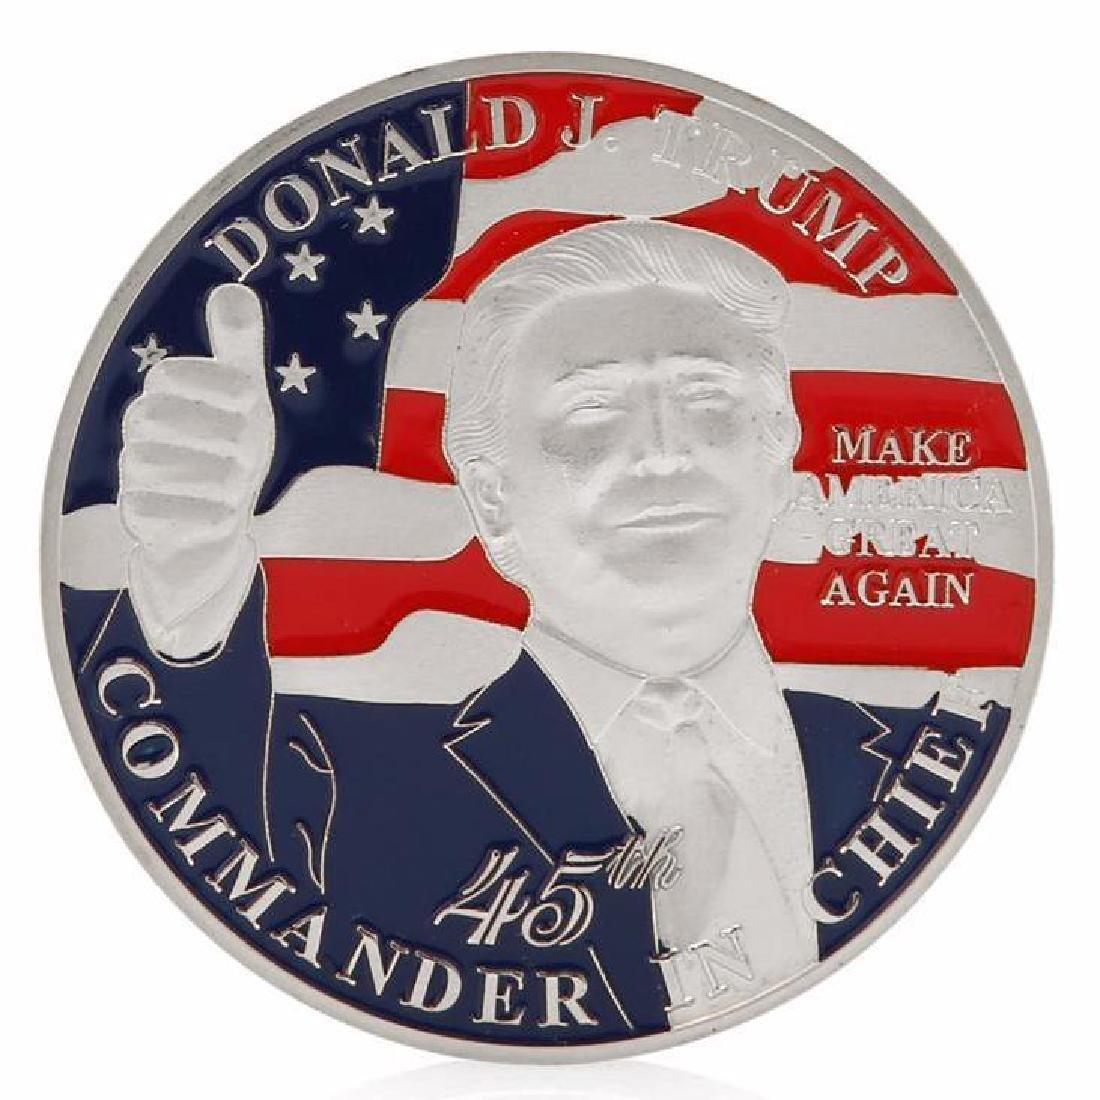 Donald Trump 45th President Silver Clad Coin